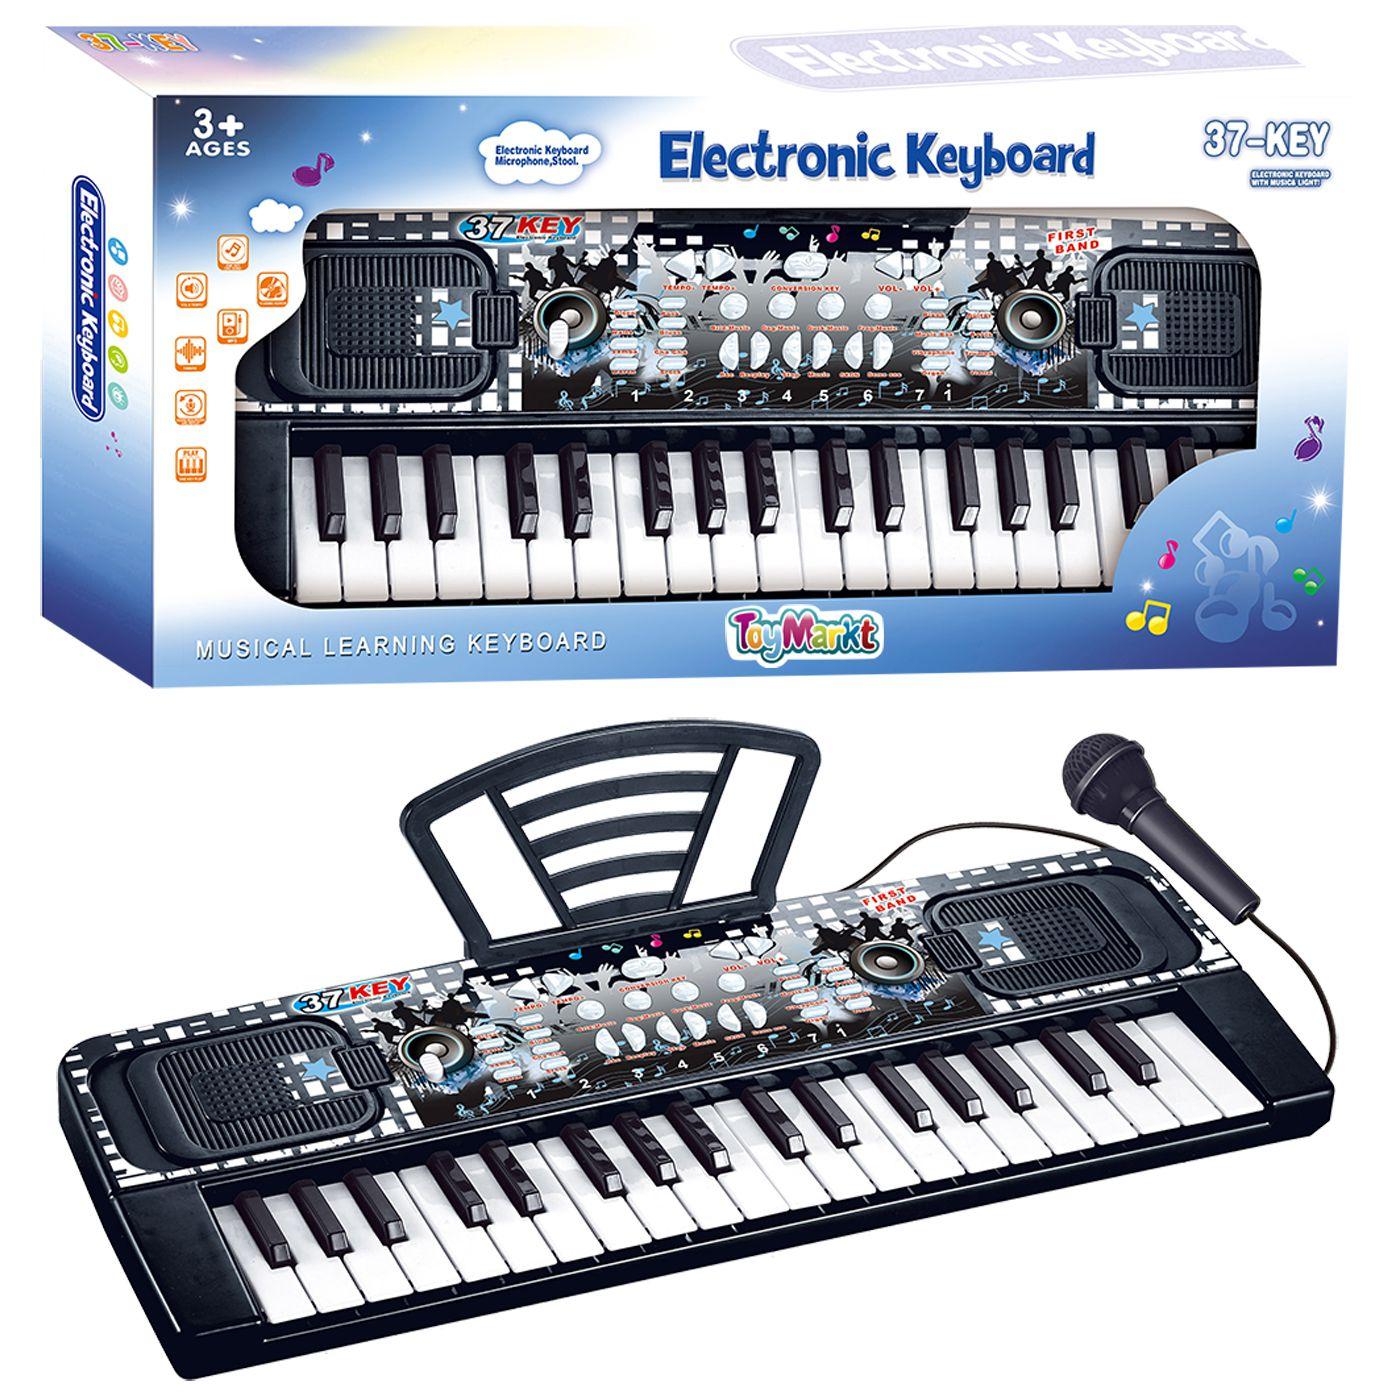 ELECTRONIC KEYBOARD 37 KEYS 50x25x5cm